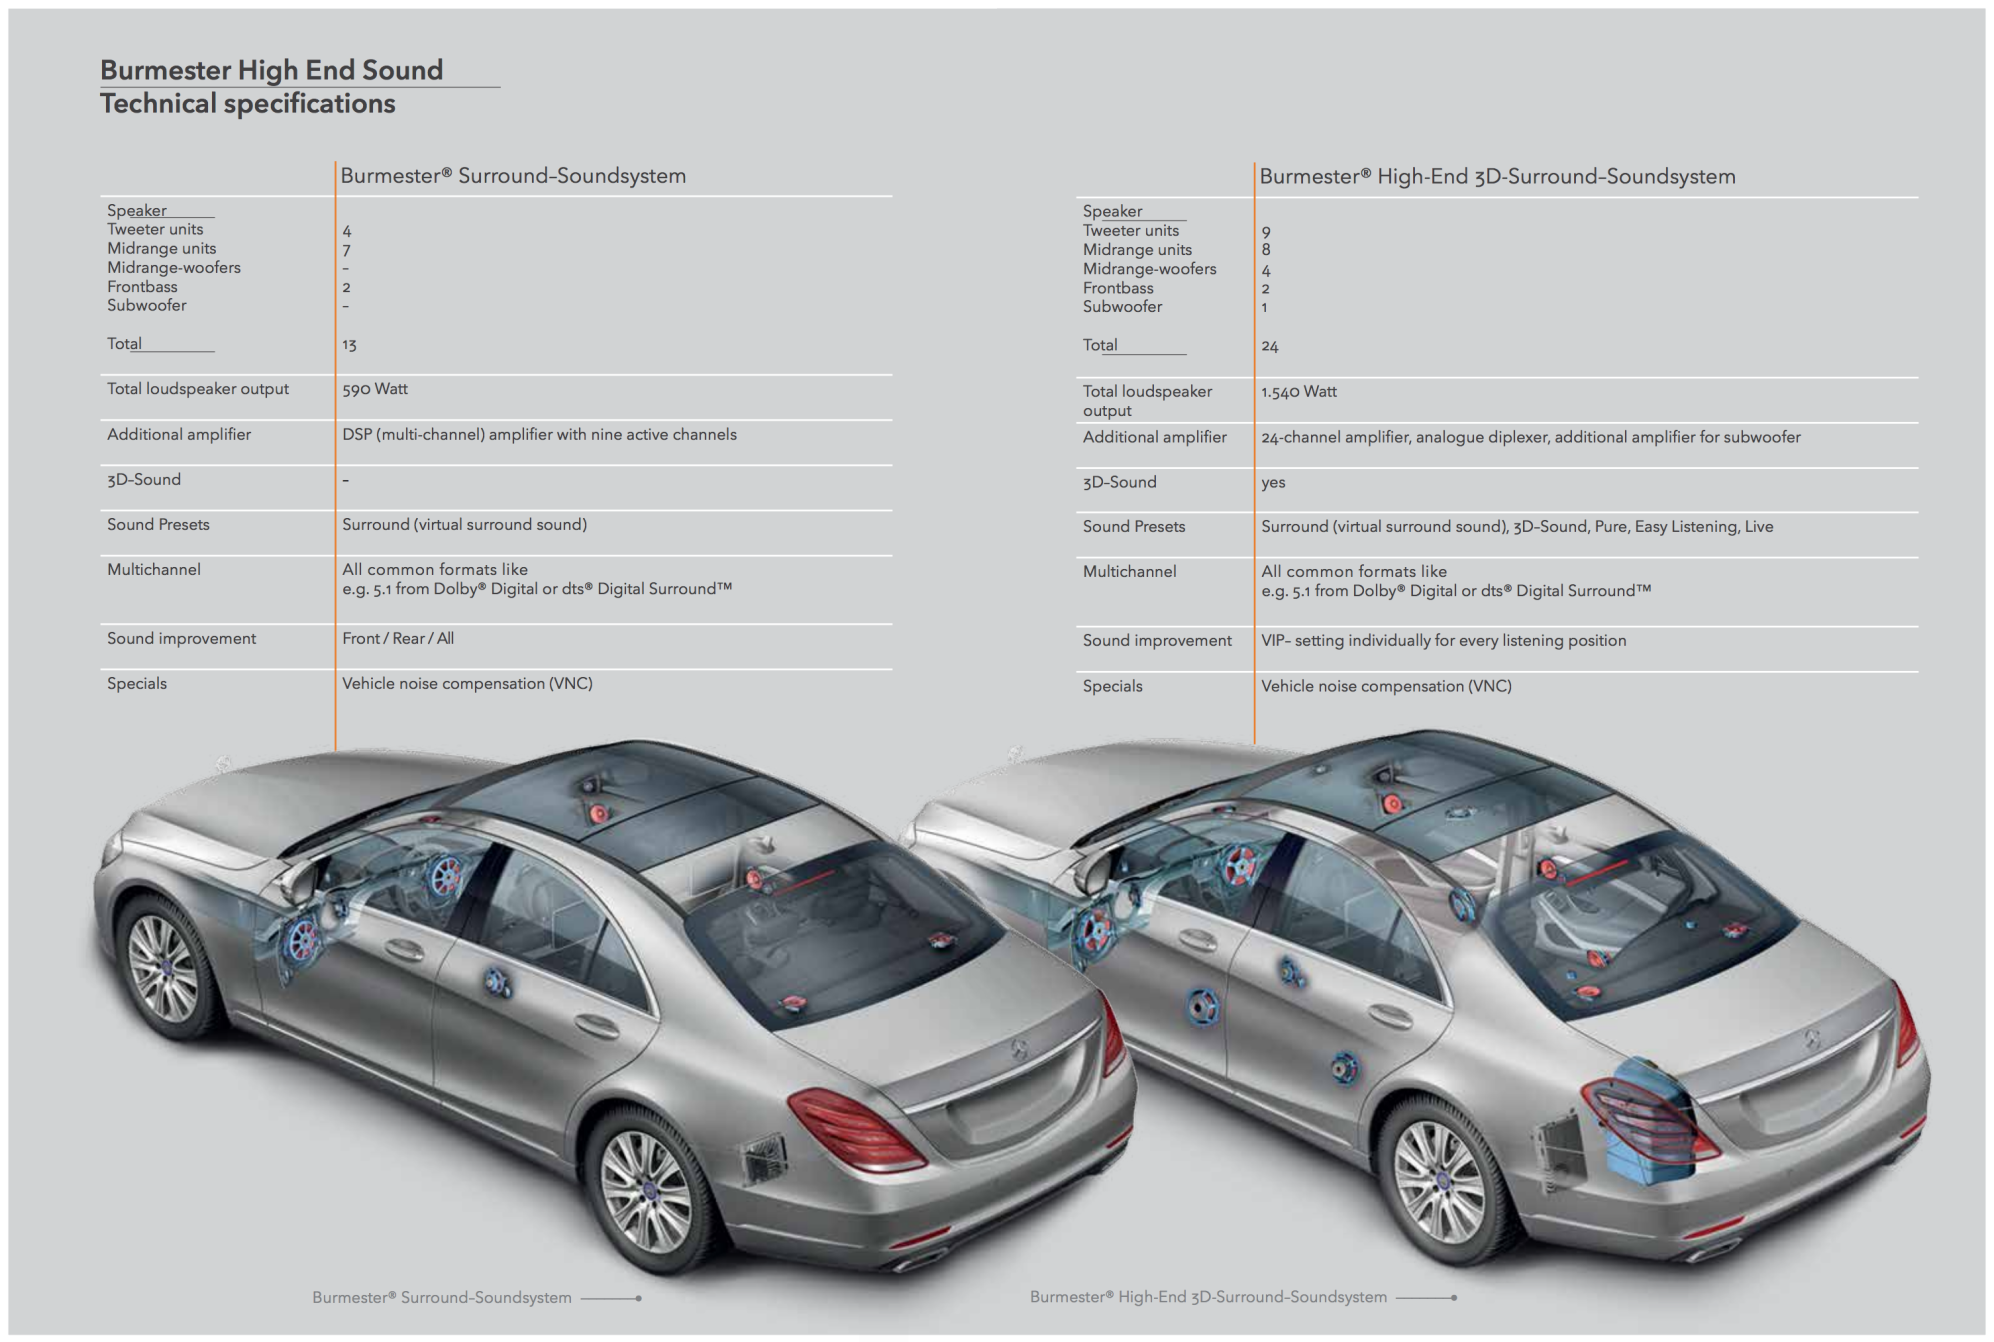 Mercedes Benz S Class Burmester Stereo Systems 13 Speaker 590 Watt S500 Wiring Diagram On The Left 24 1540 Right